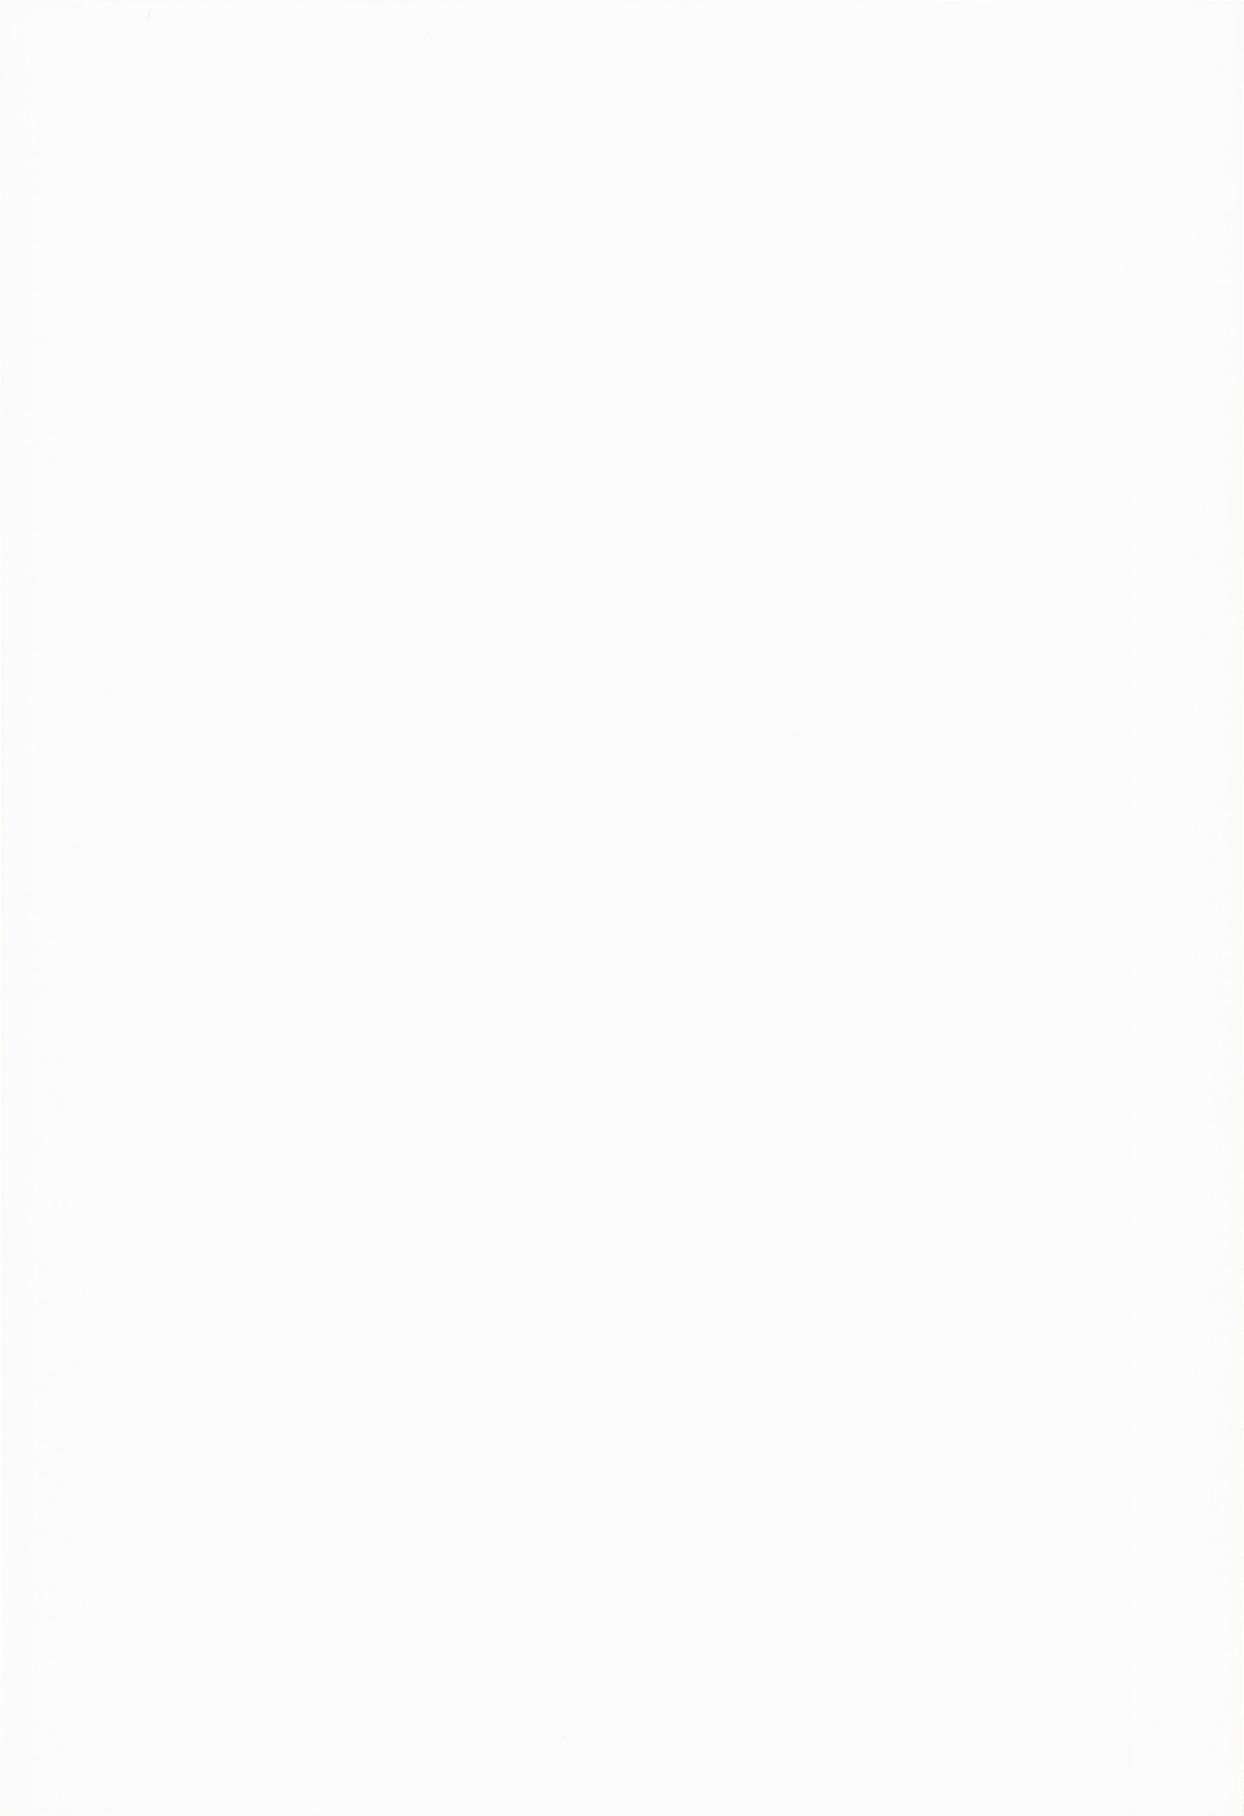 (COMIC1☆8) [Hisagoya (Momio,Miyamoto Issa,Shoukaki)] Gakuen wo Sukutta Kimo-ota Kishi sama ga Bisyoujo Ryu-musume to Ecchi na Koto suru Hon (Rage of Bahamut) 1